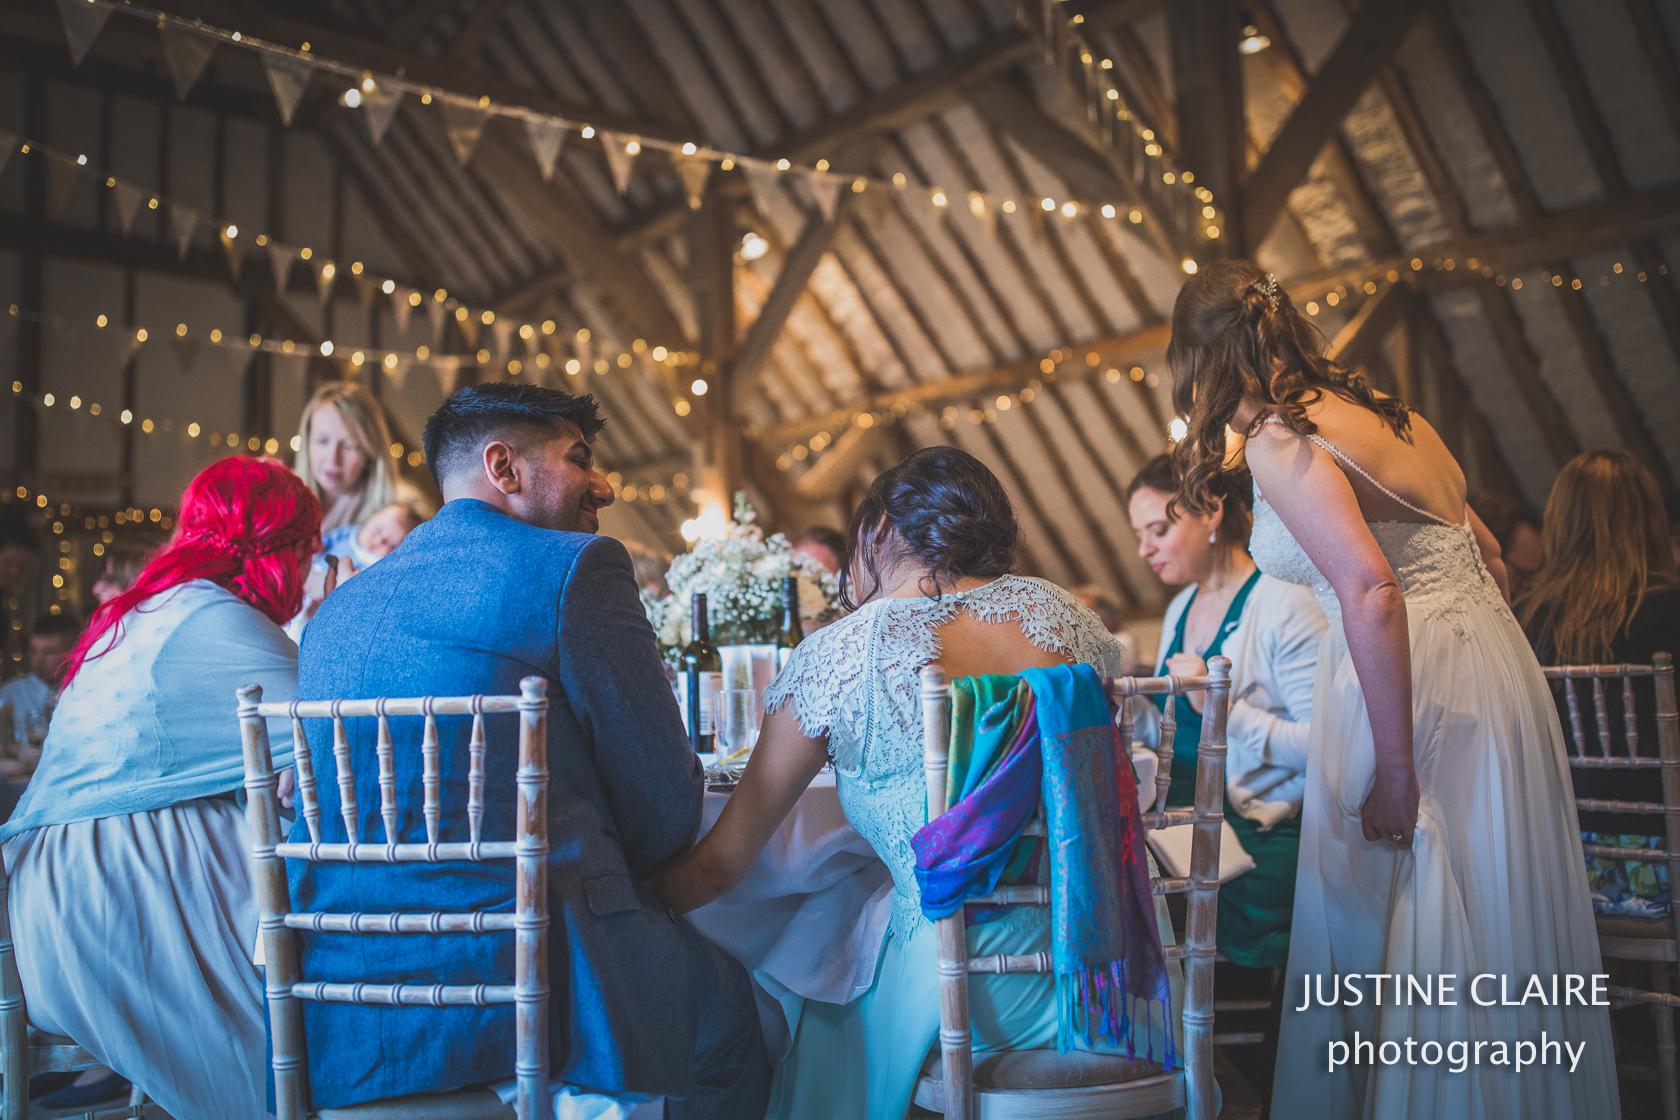 Fitzleroi Fittleworth petworth Billingshurst farm Wedding Photography by Justine Claire photographer Arundel Worthing Brighton-58.jpg